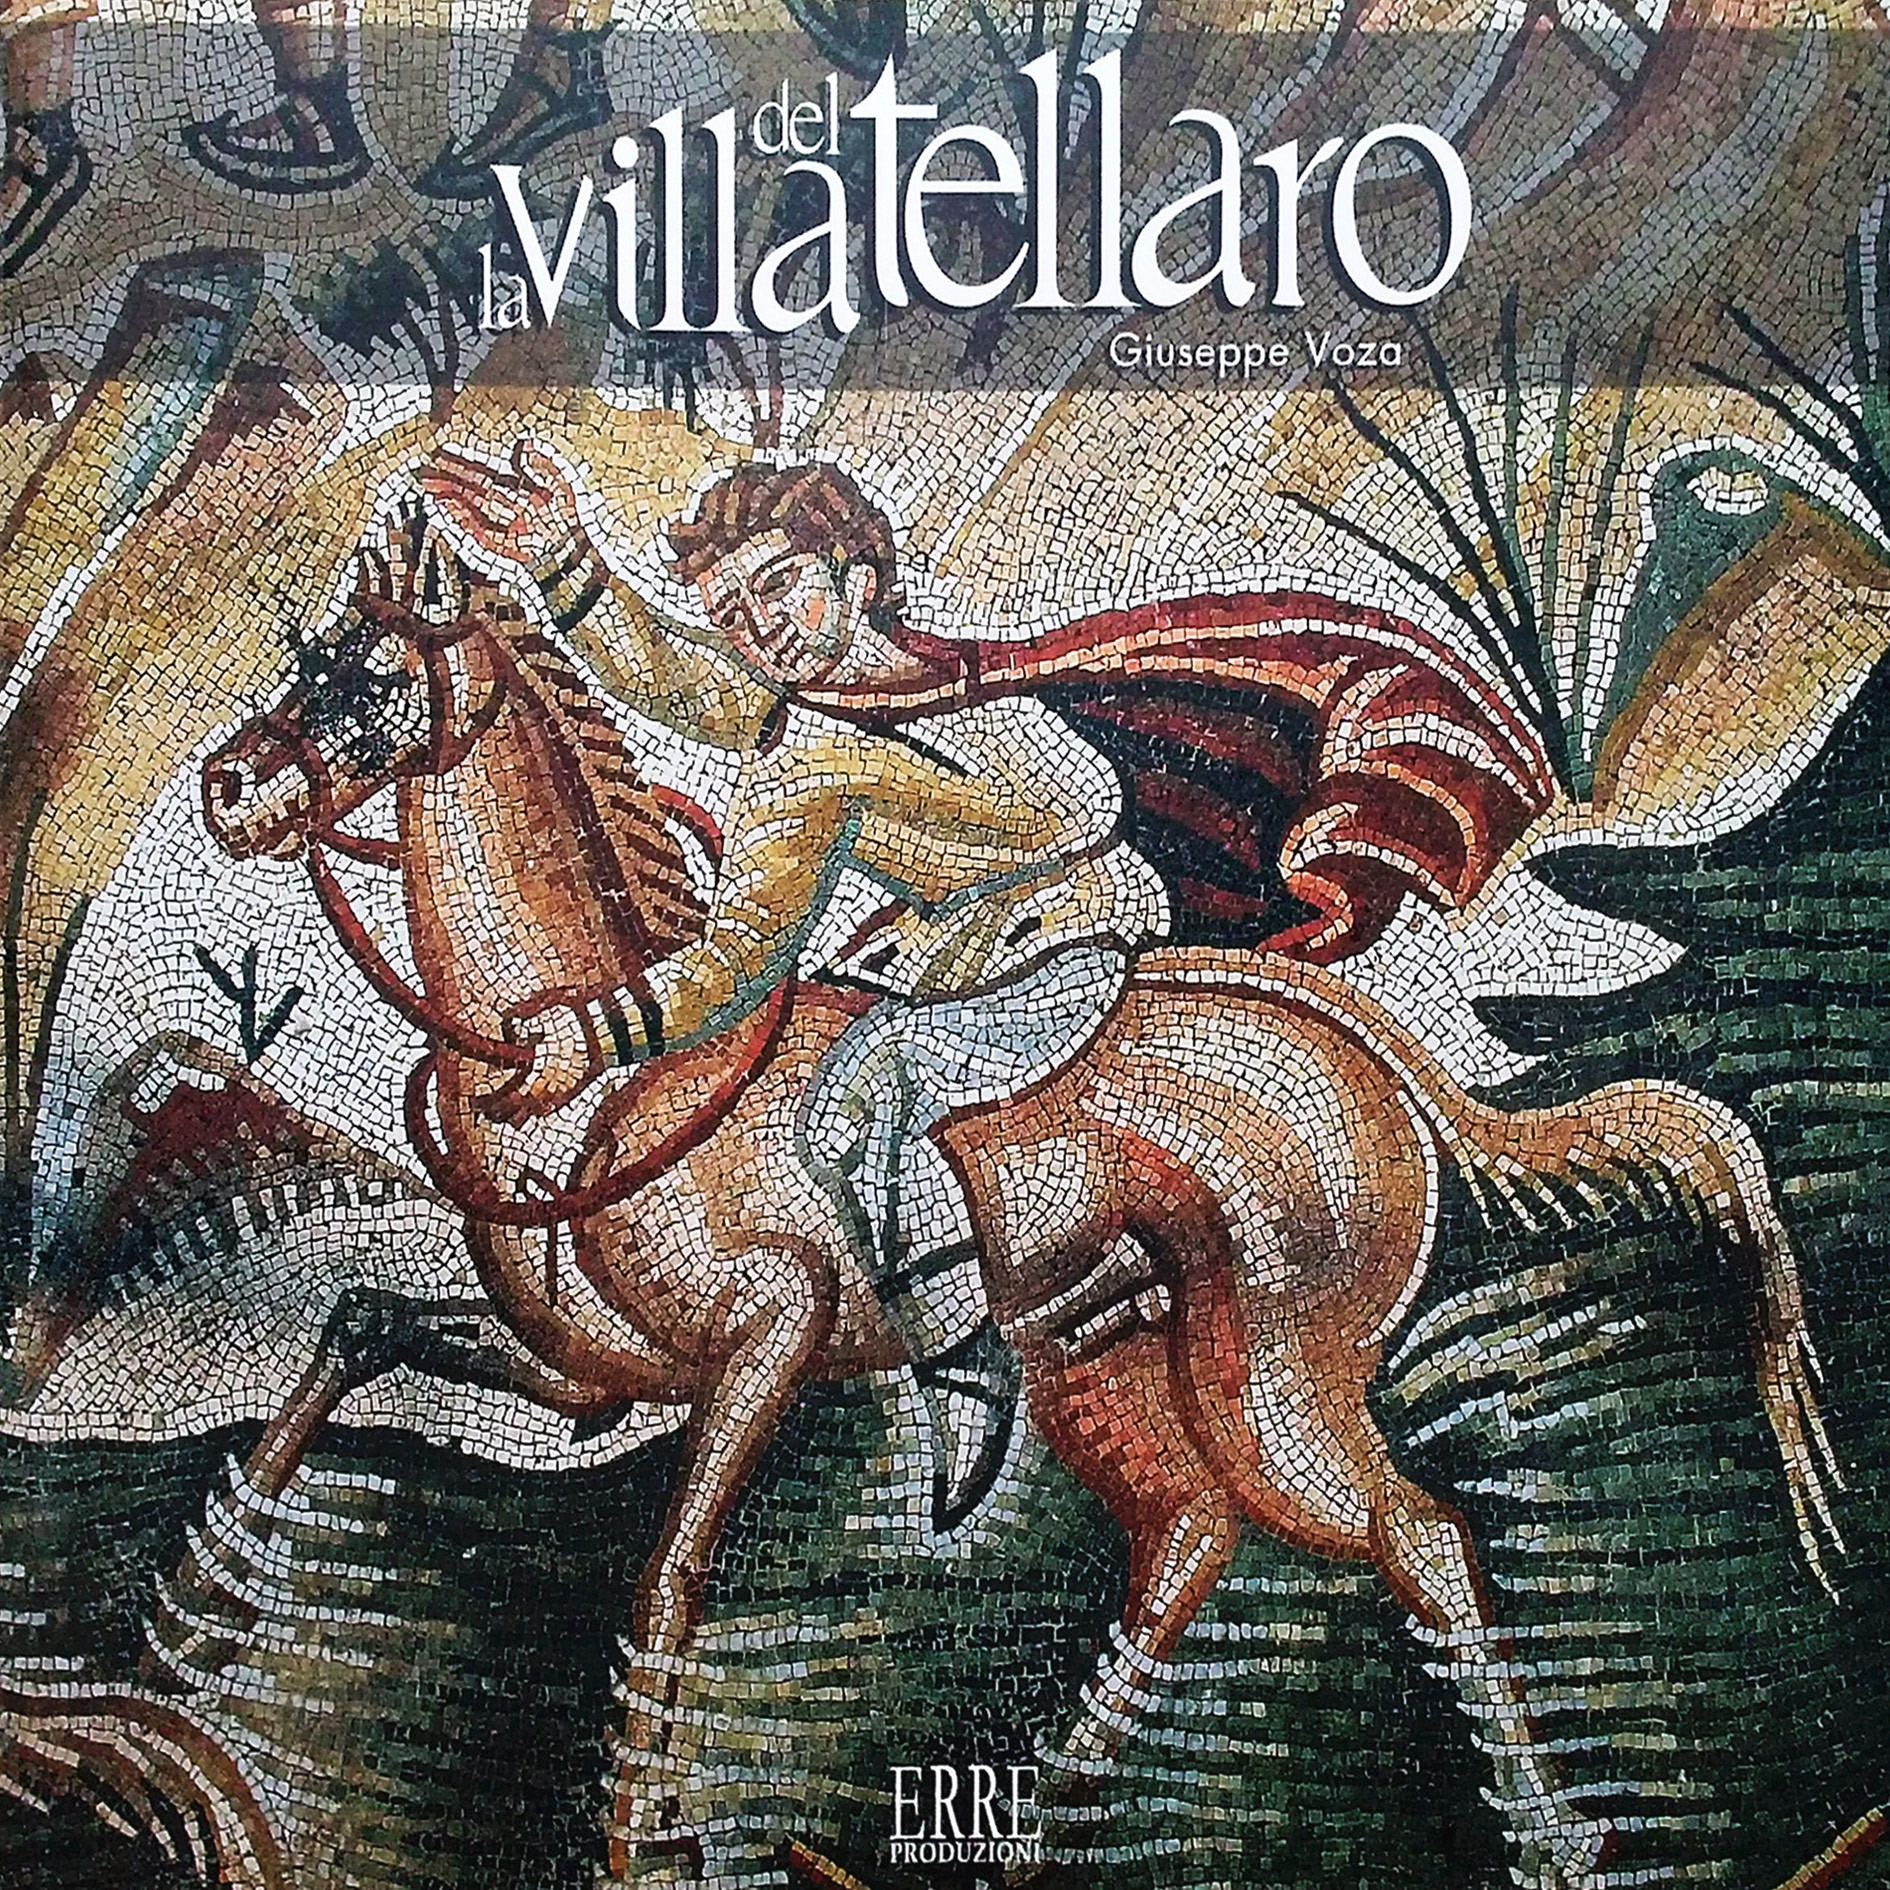 Villa del Tellaro, ErreProduzioni